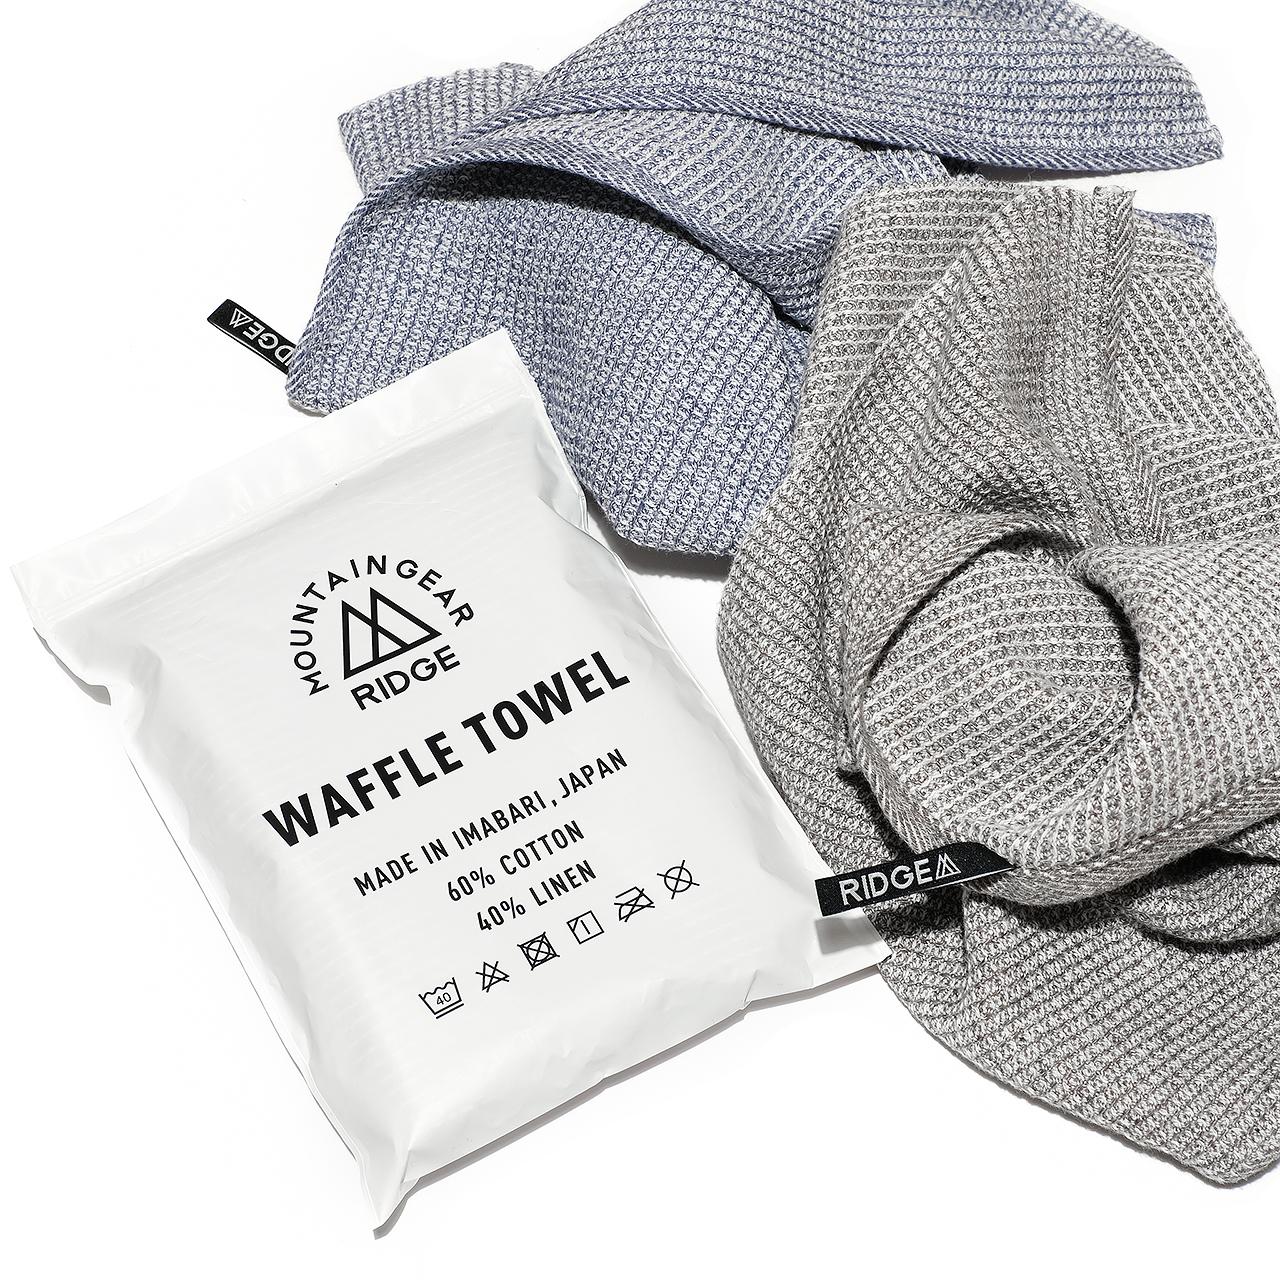 Waffle Towel